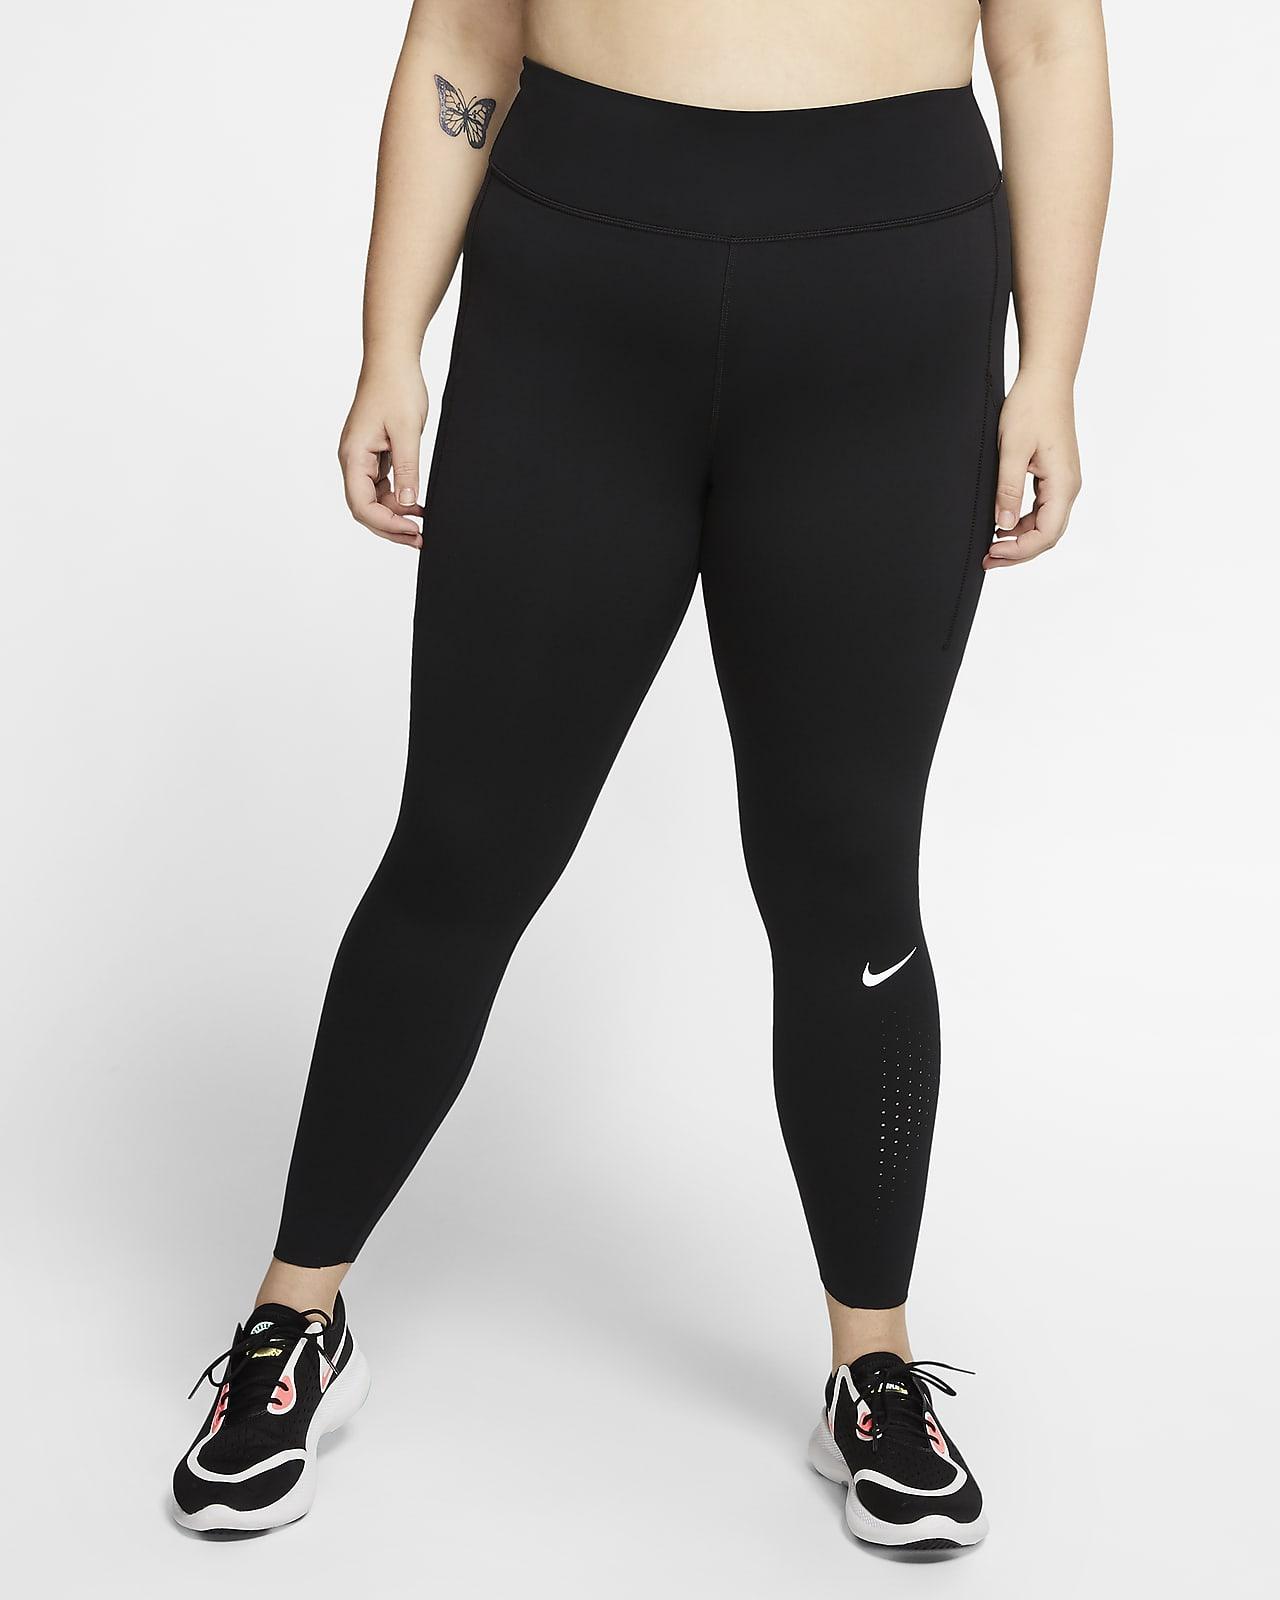 Nike Epic Luxe Women's Running Leggings (Plus Size)